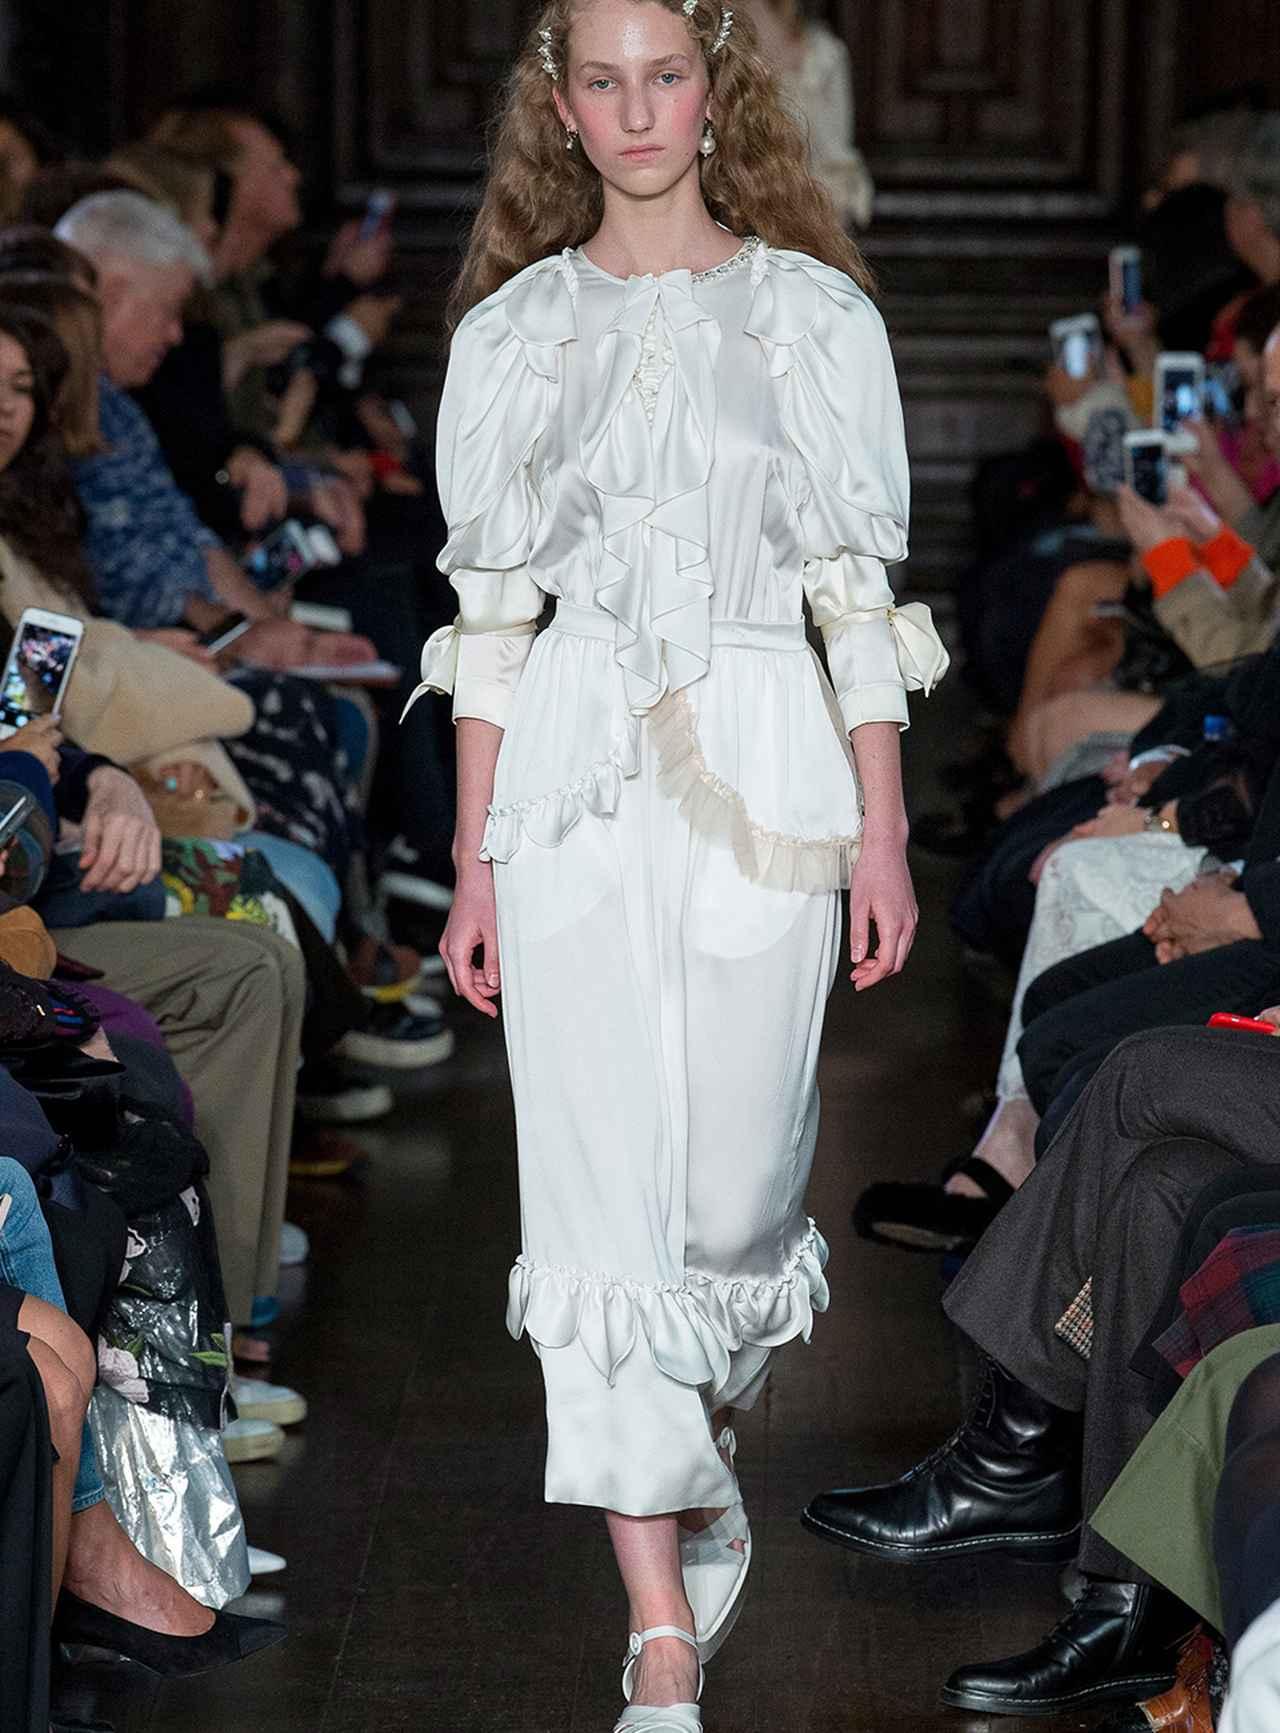 Images : 6番目の画像 - 「ドレス自由自在<Vol.2> 新しい才能が花盛り。 ニュー・ドレス時代到来」のアルバム - T JAPAN:The New York Times Style Magazine 公式サイト